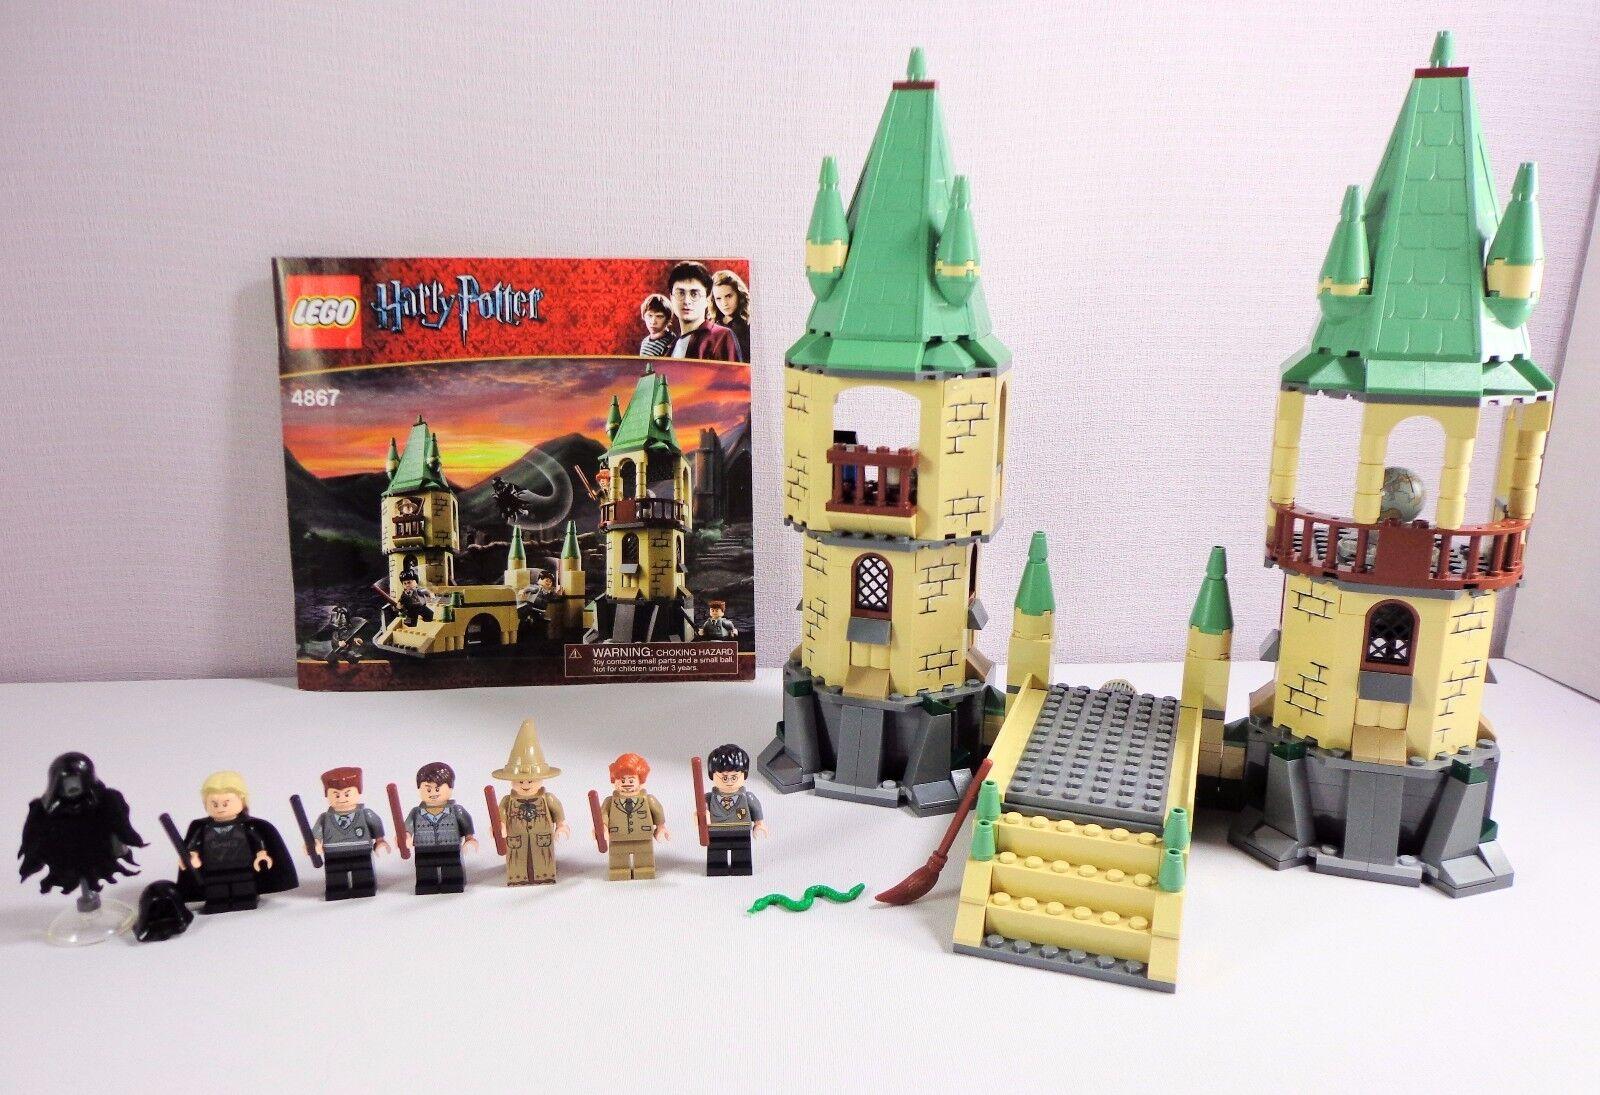 Lego Harry Potter 4867 Hogwarts Dementor Malfoy Neville Professor Sprout Lupin